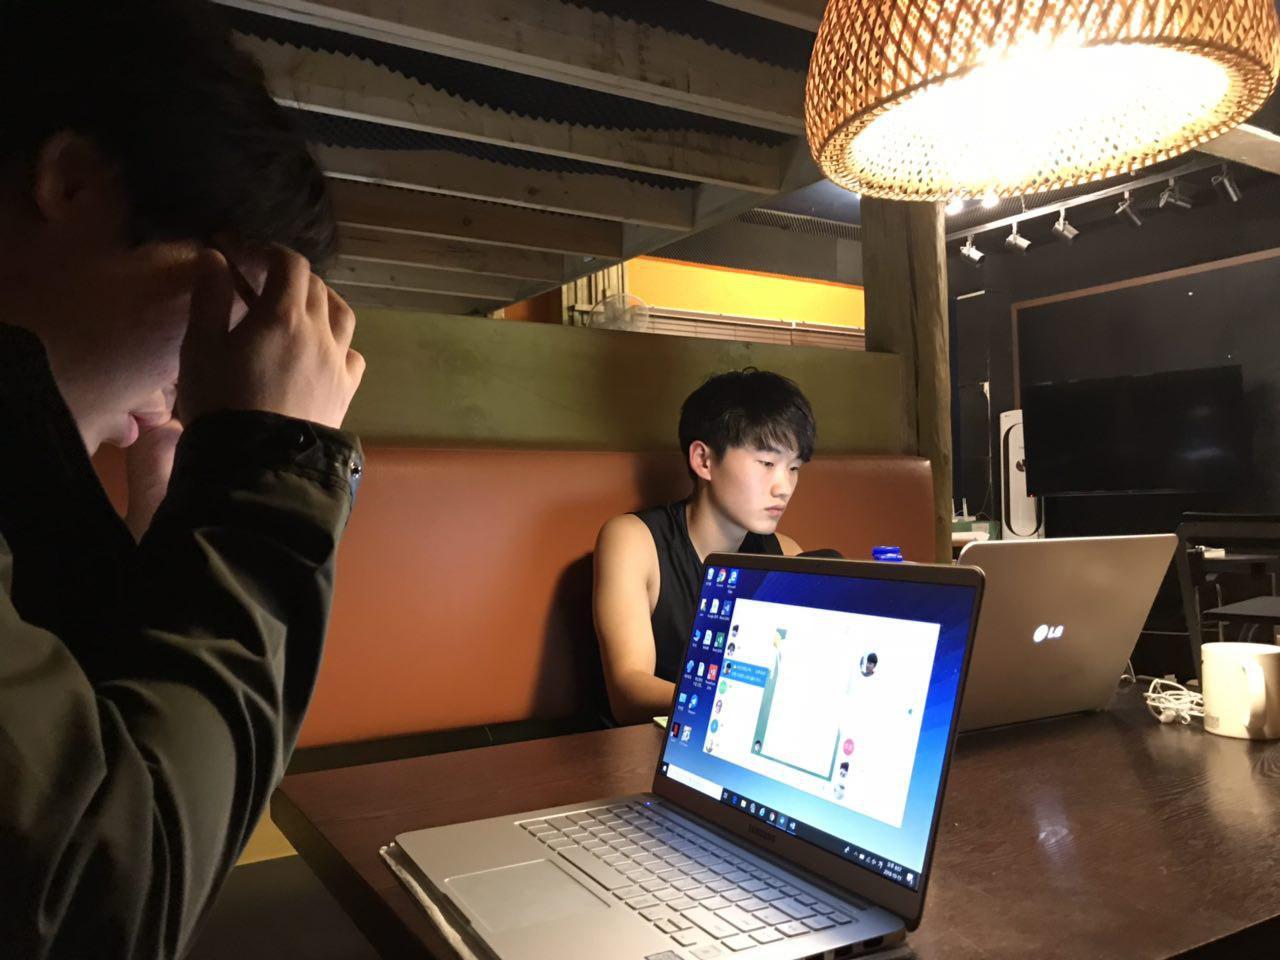 photo_2018-10-13_21-03-13.jpg